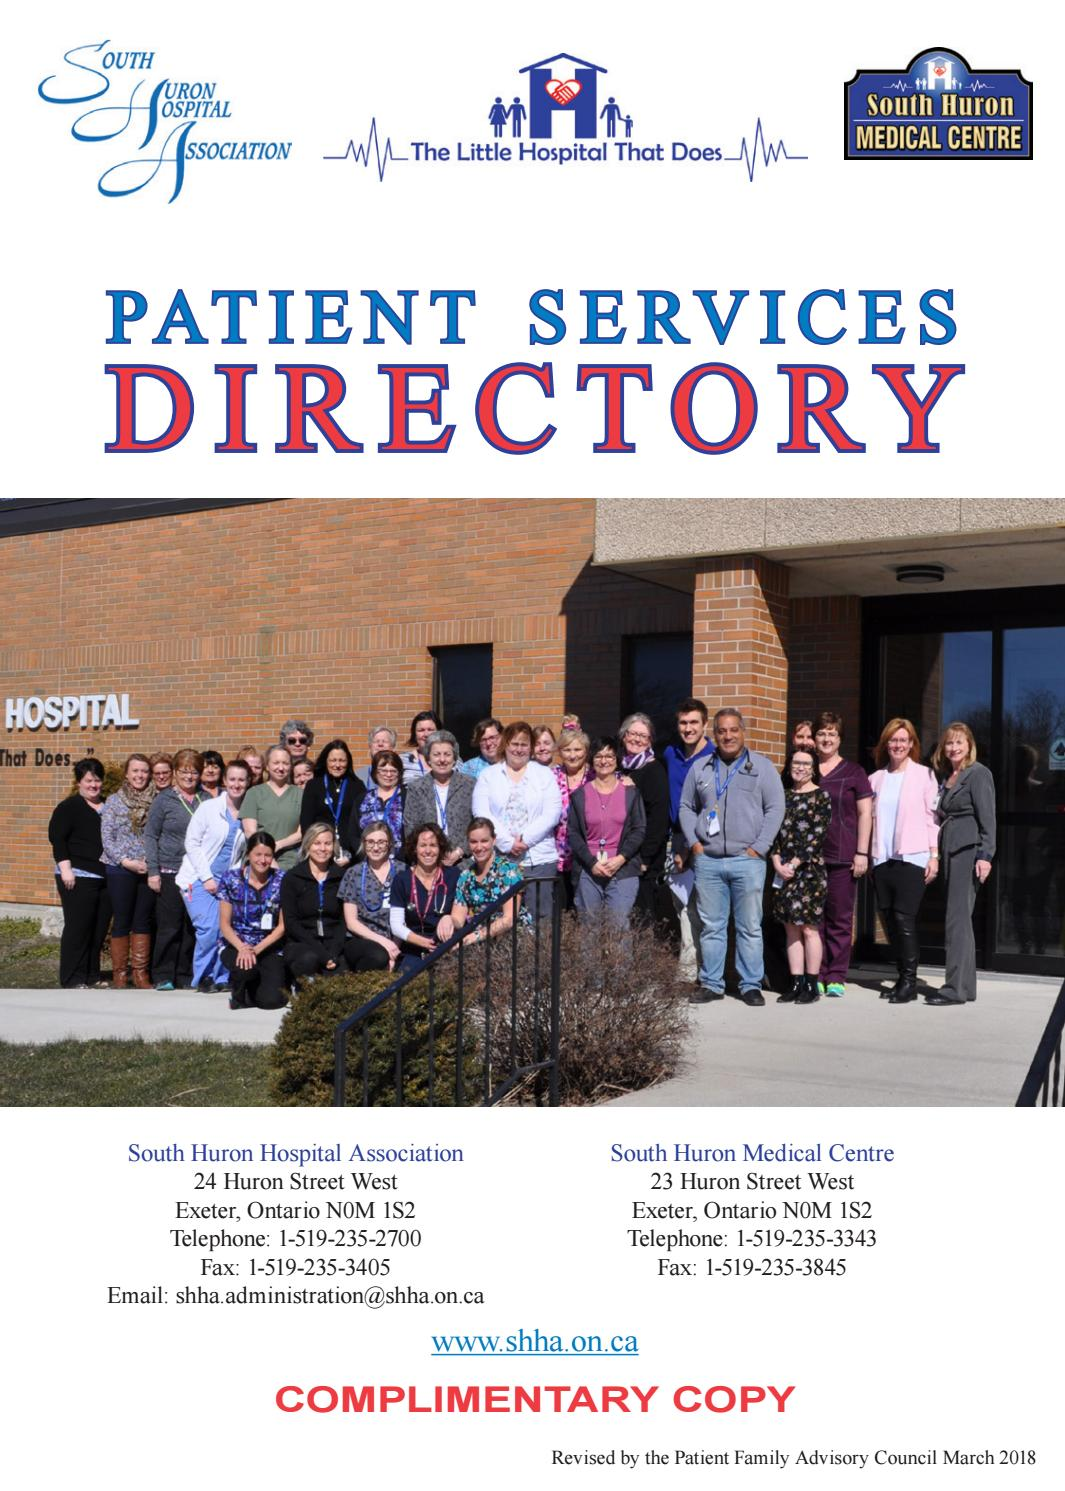 South Huron Hospital Association Patient Services Directory